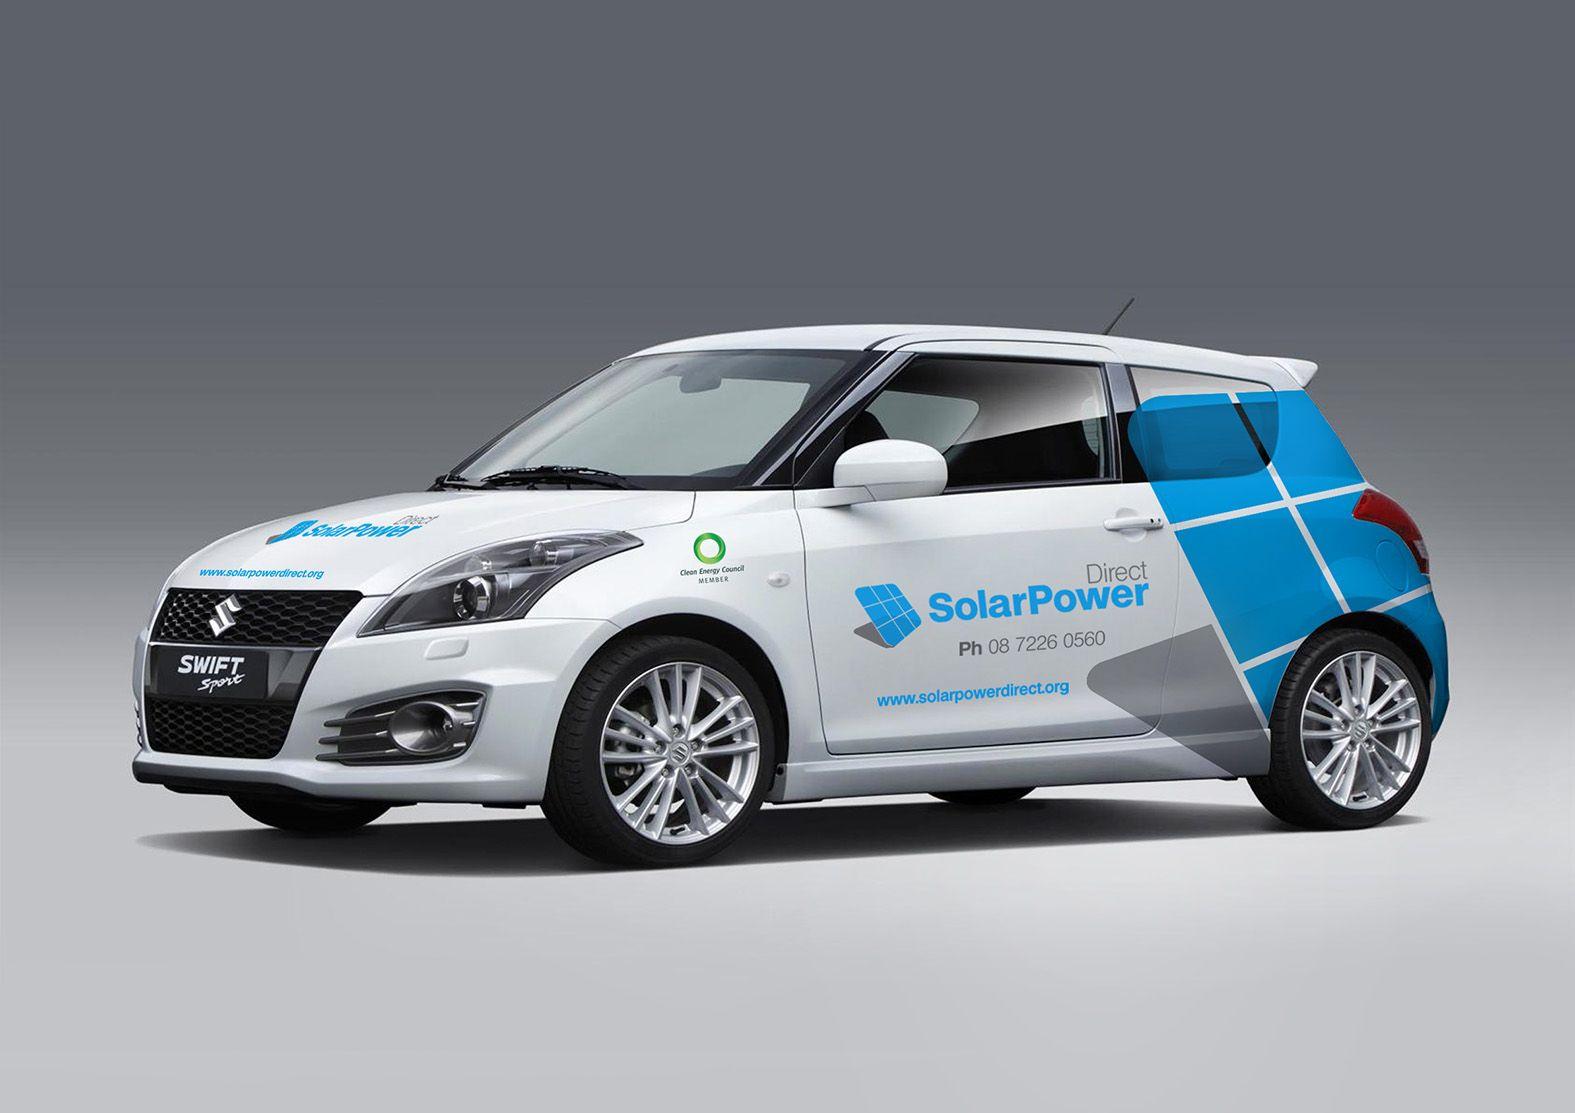 Vw Of Kirkland >> vehicle branding - Buscar con Google | Vehicle signage ...